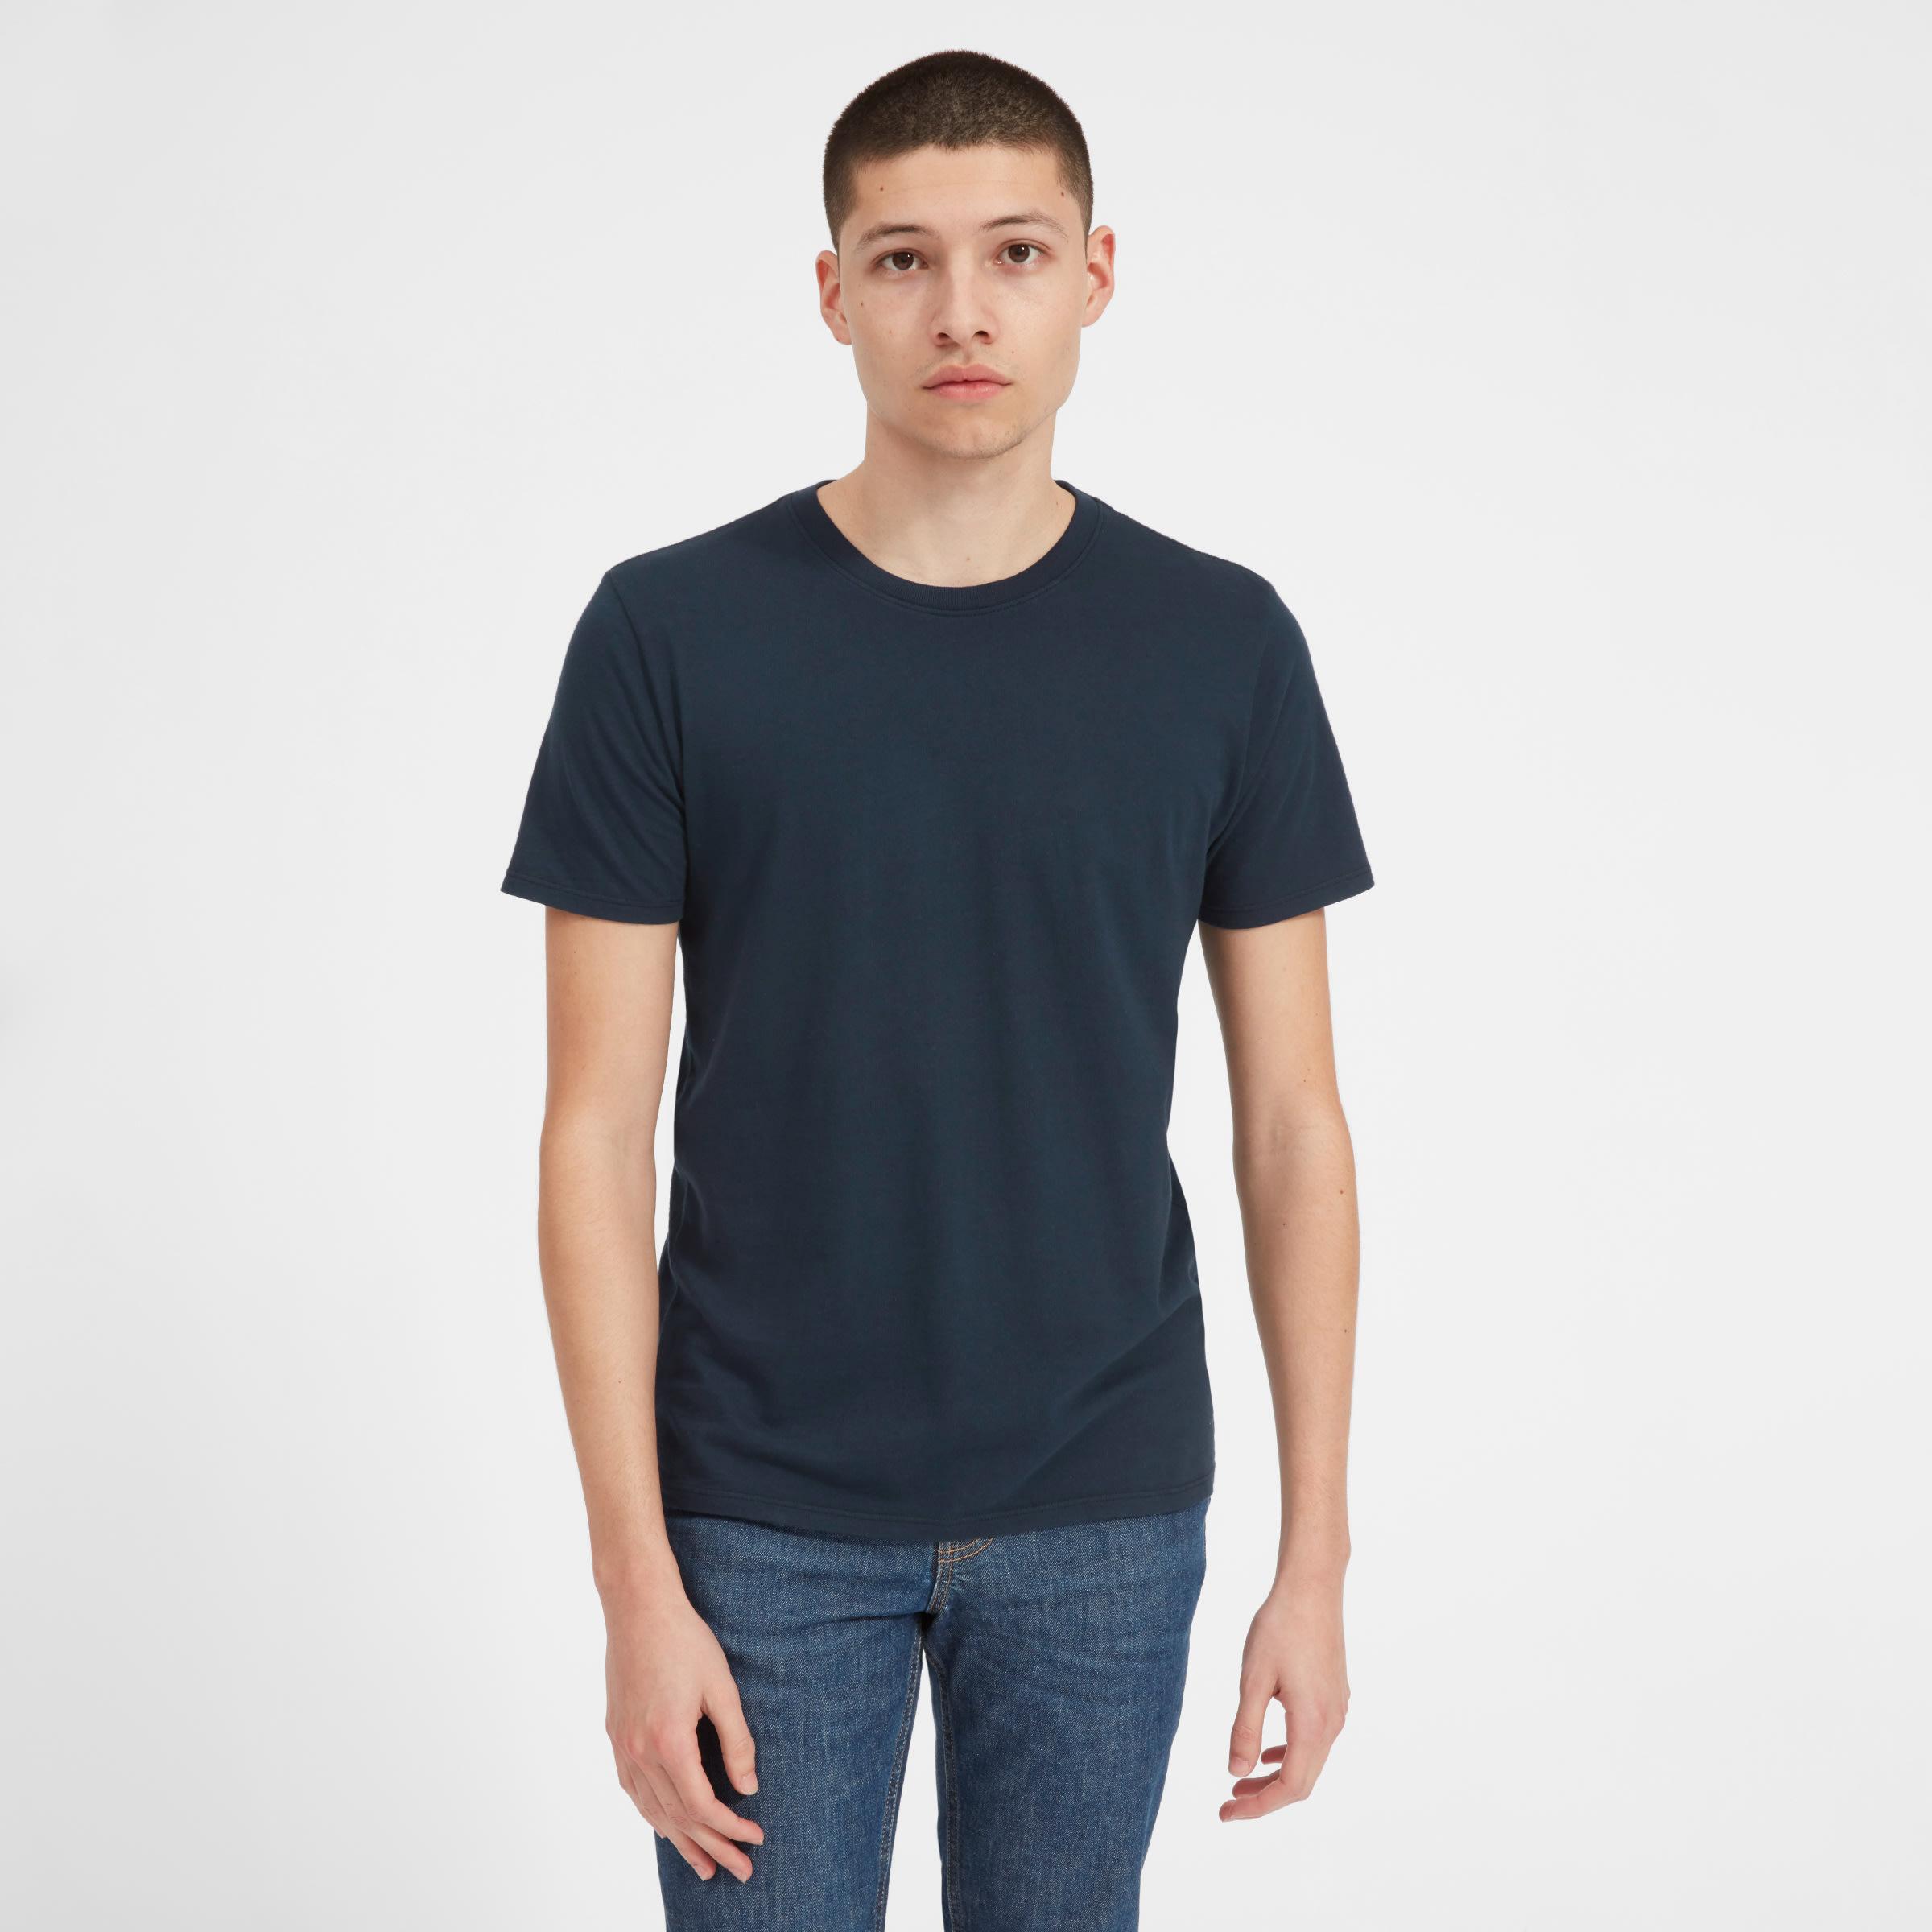 b907b20482a1 Men's Tees: V-Neck, Crew, & Short Sleeve T-Shirts for Men | Everlane